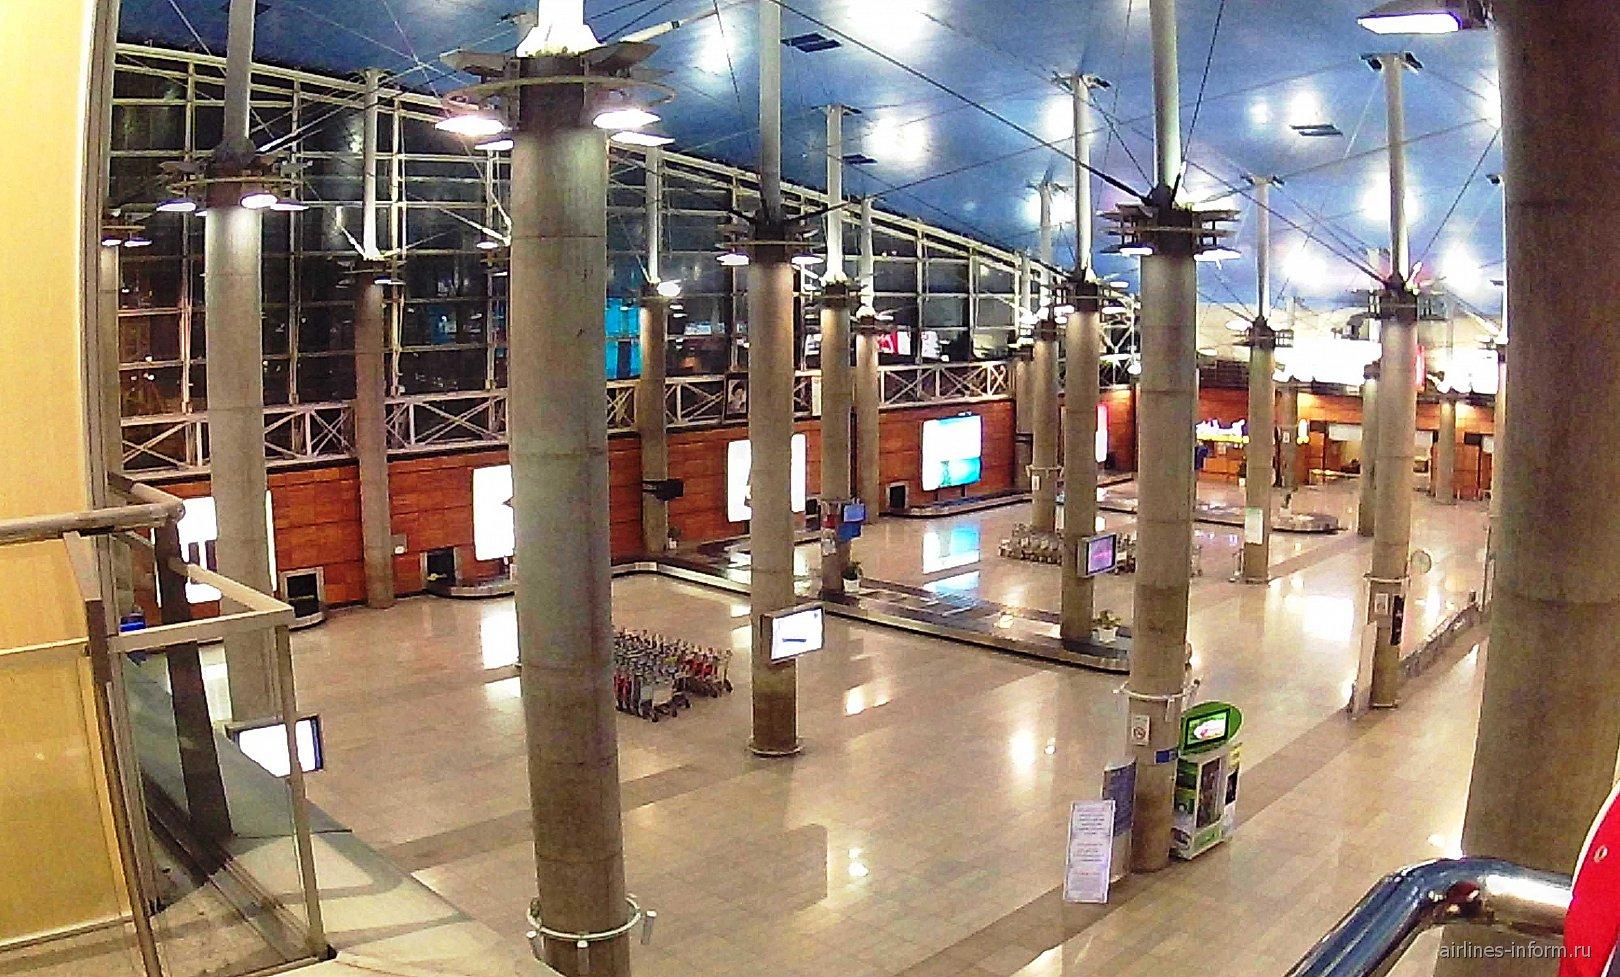 Зал выдачи багажа в аэропорту Тегеран Имам Хомейни